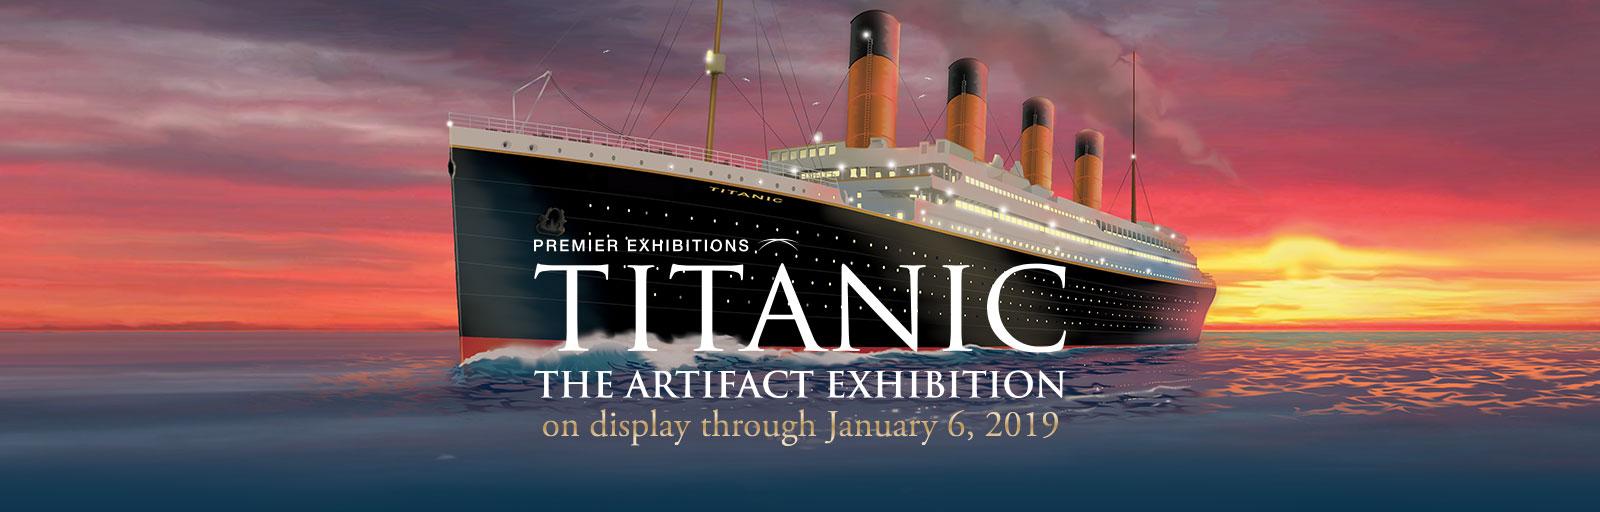 titanic-onsale